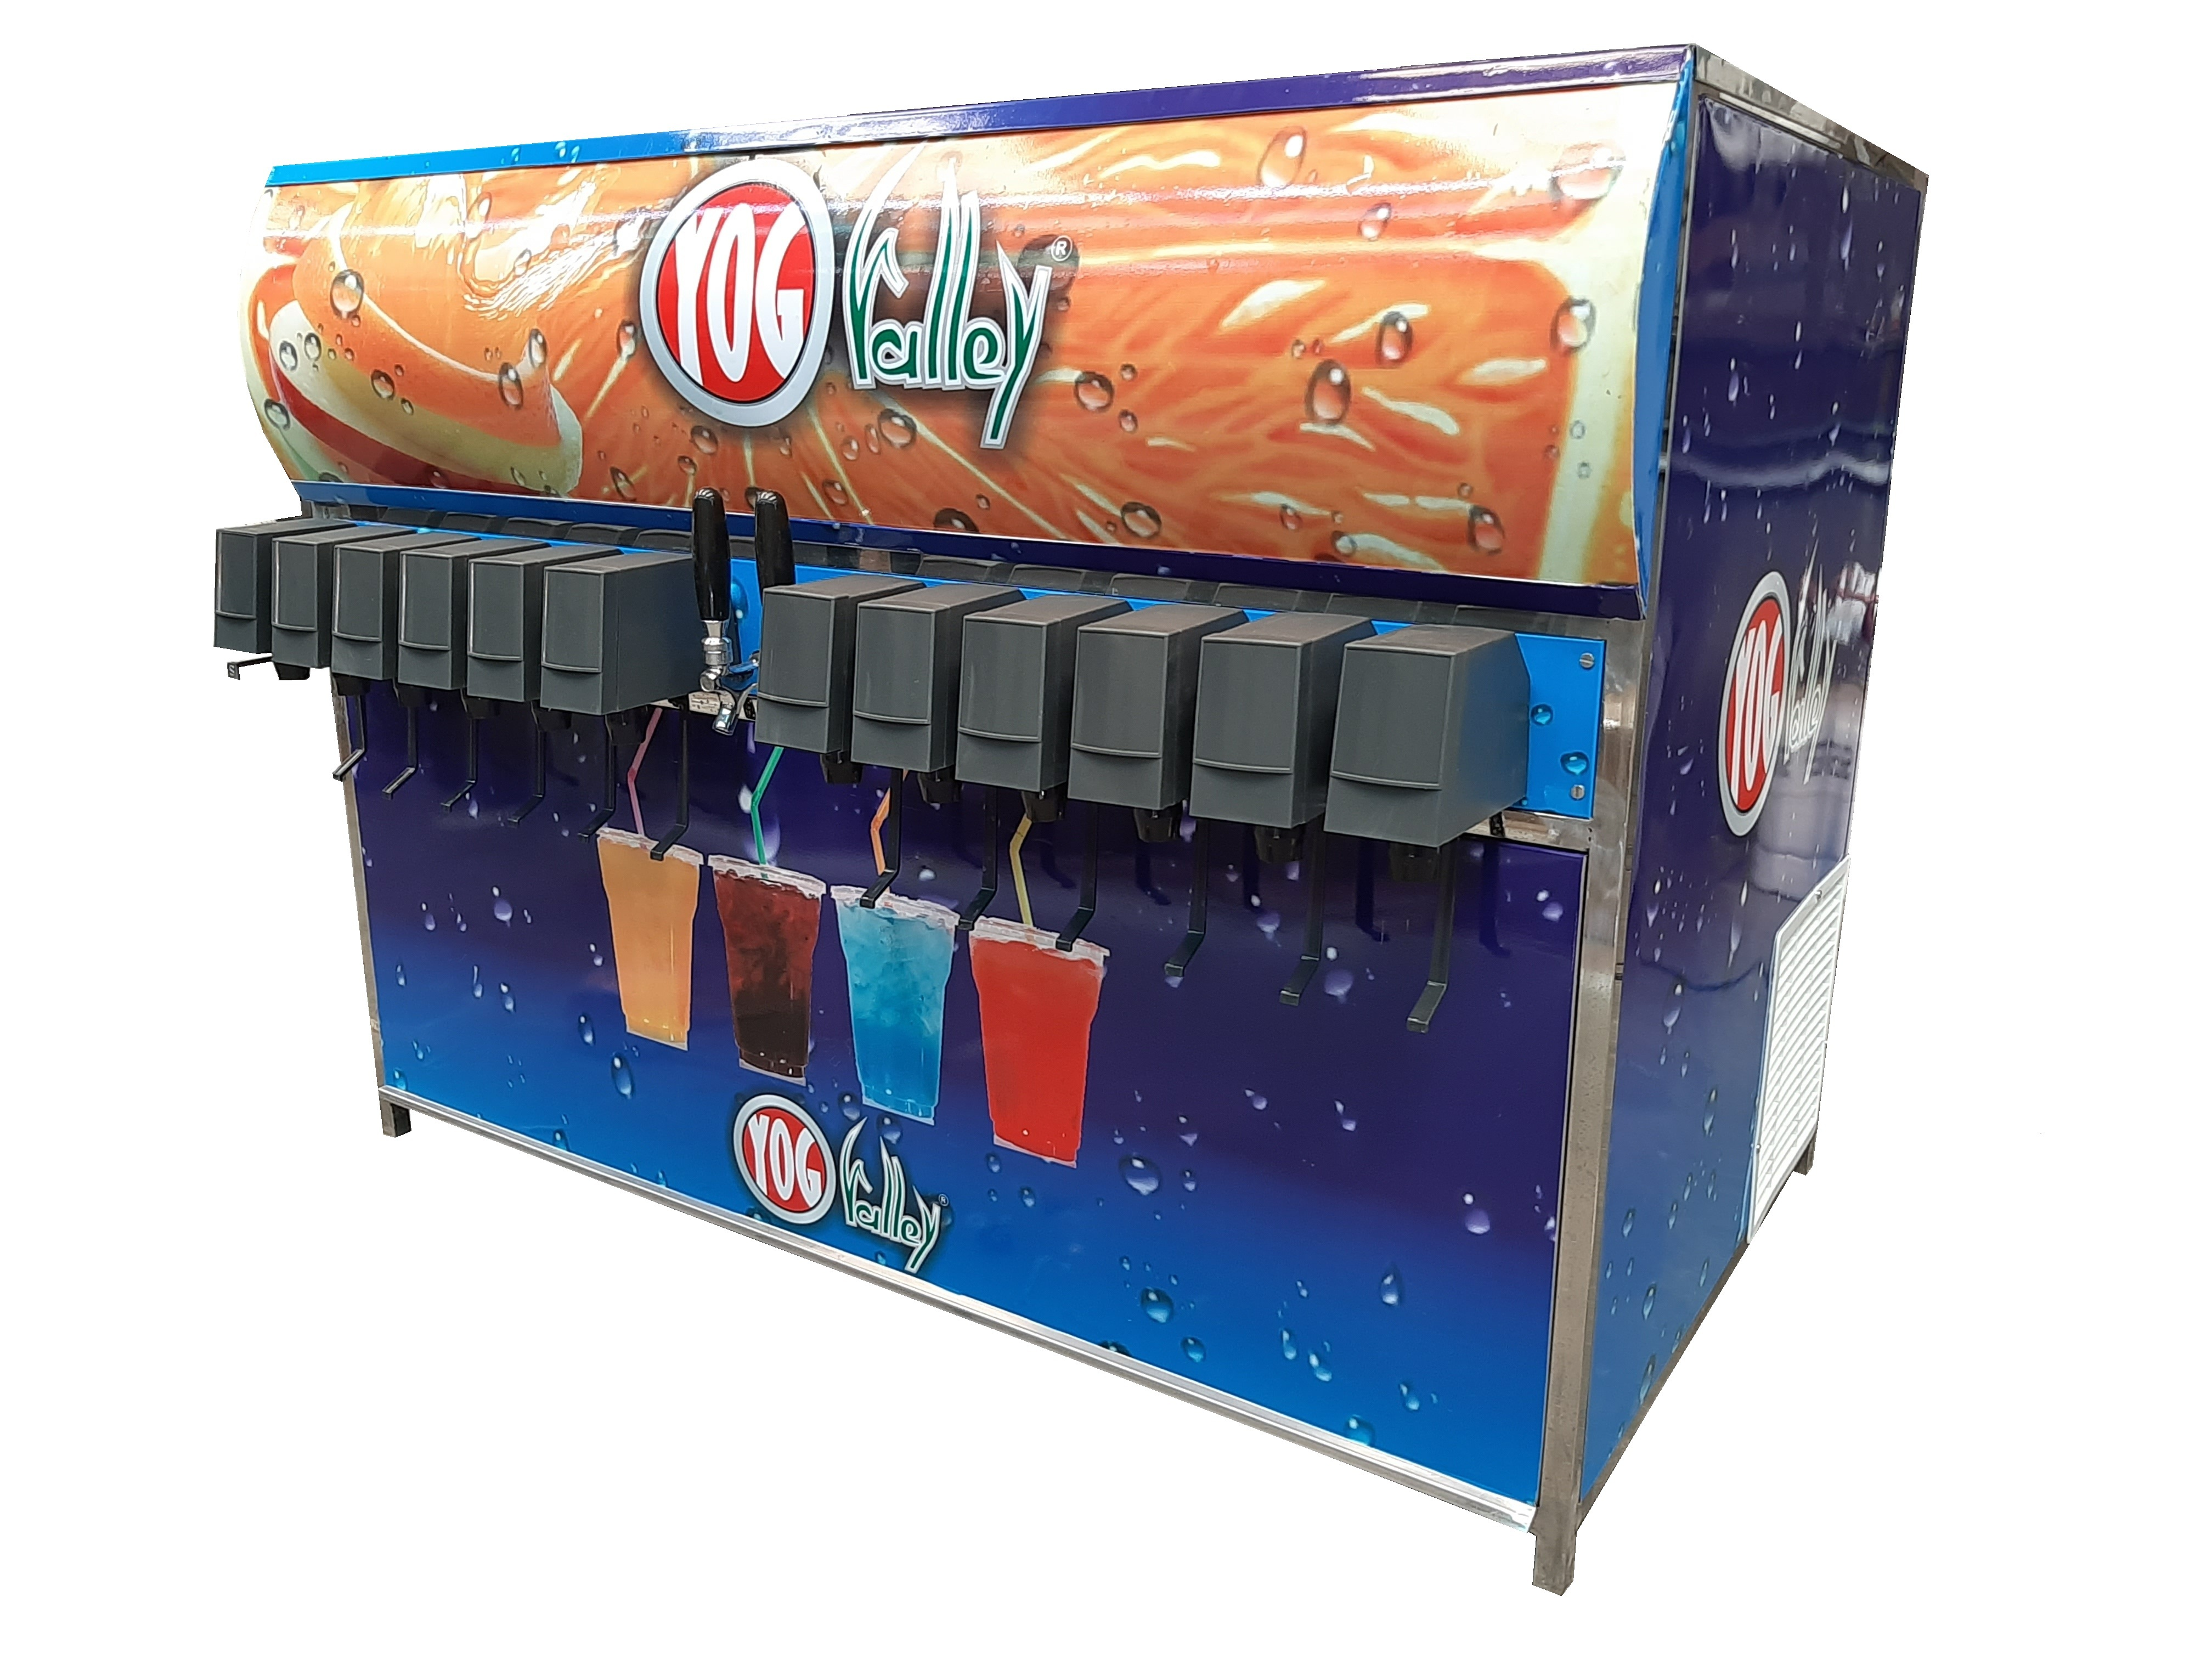 Stainless Steel Soda Shop Machine